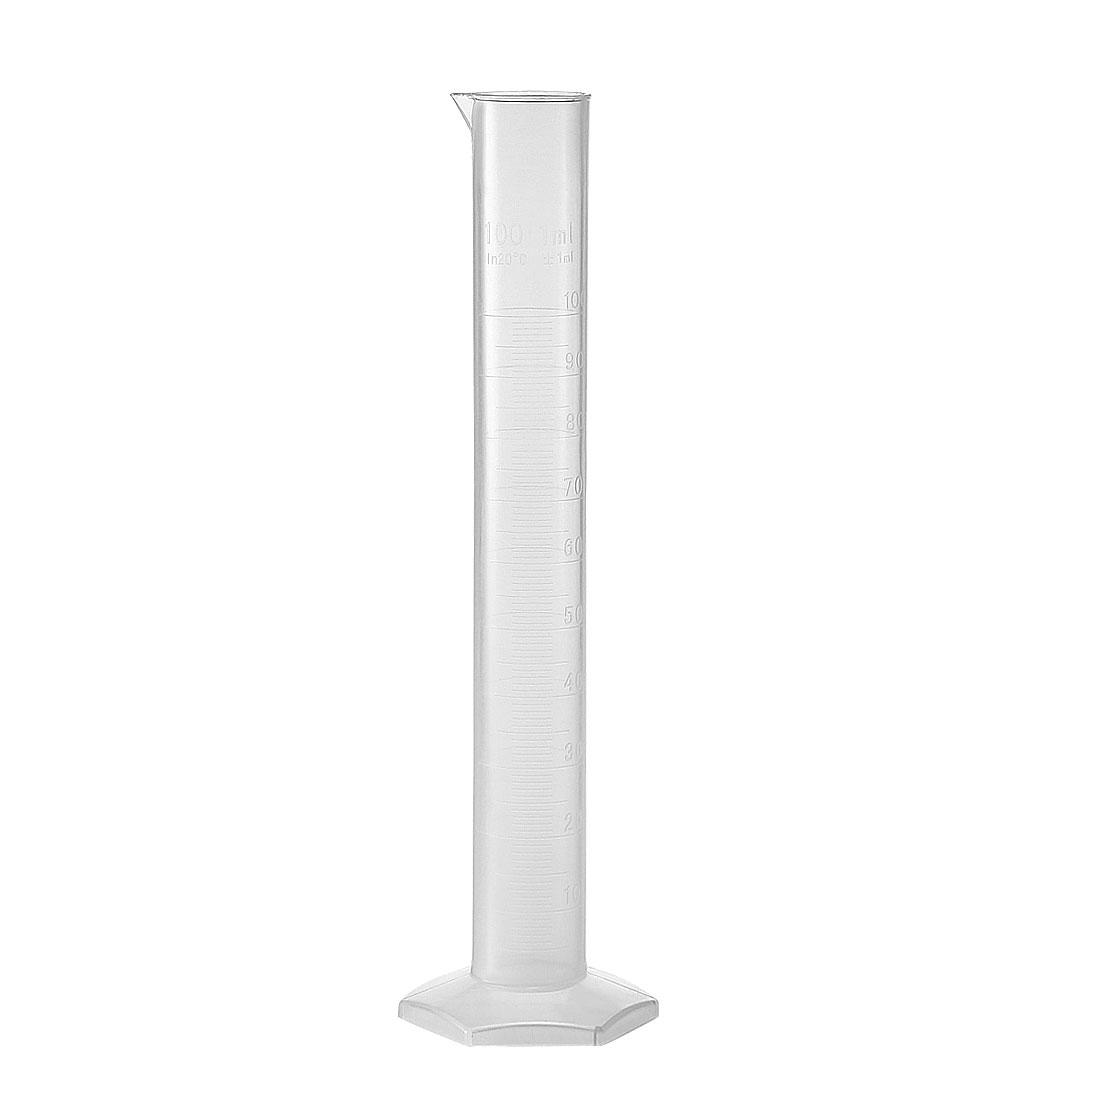 100ml Laboratory Measurements Clear White Plastic